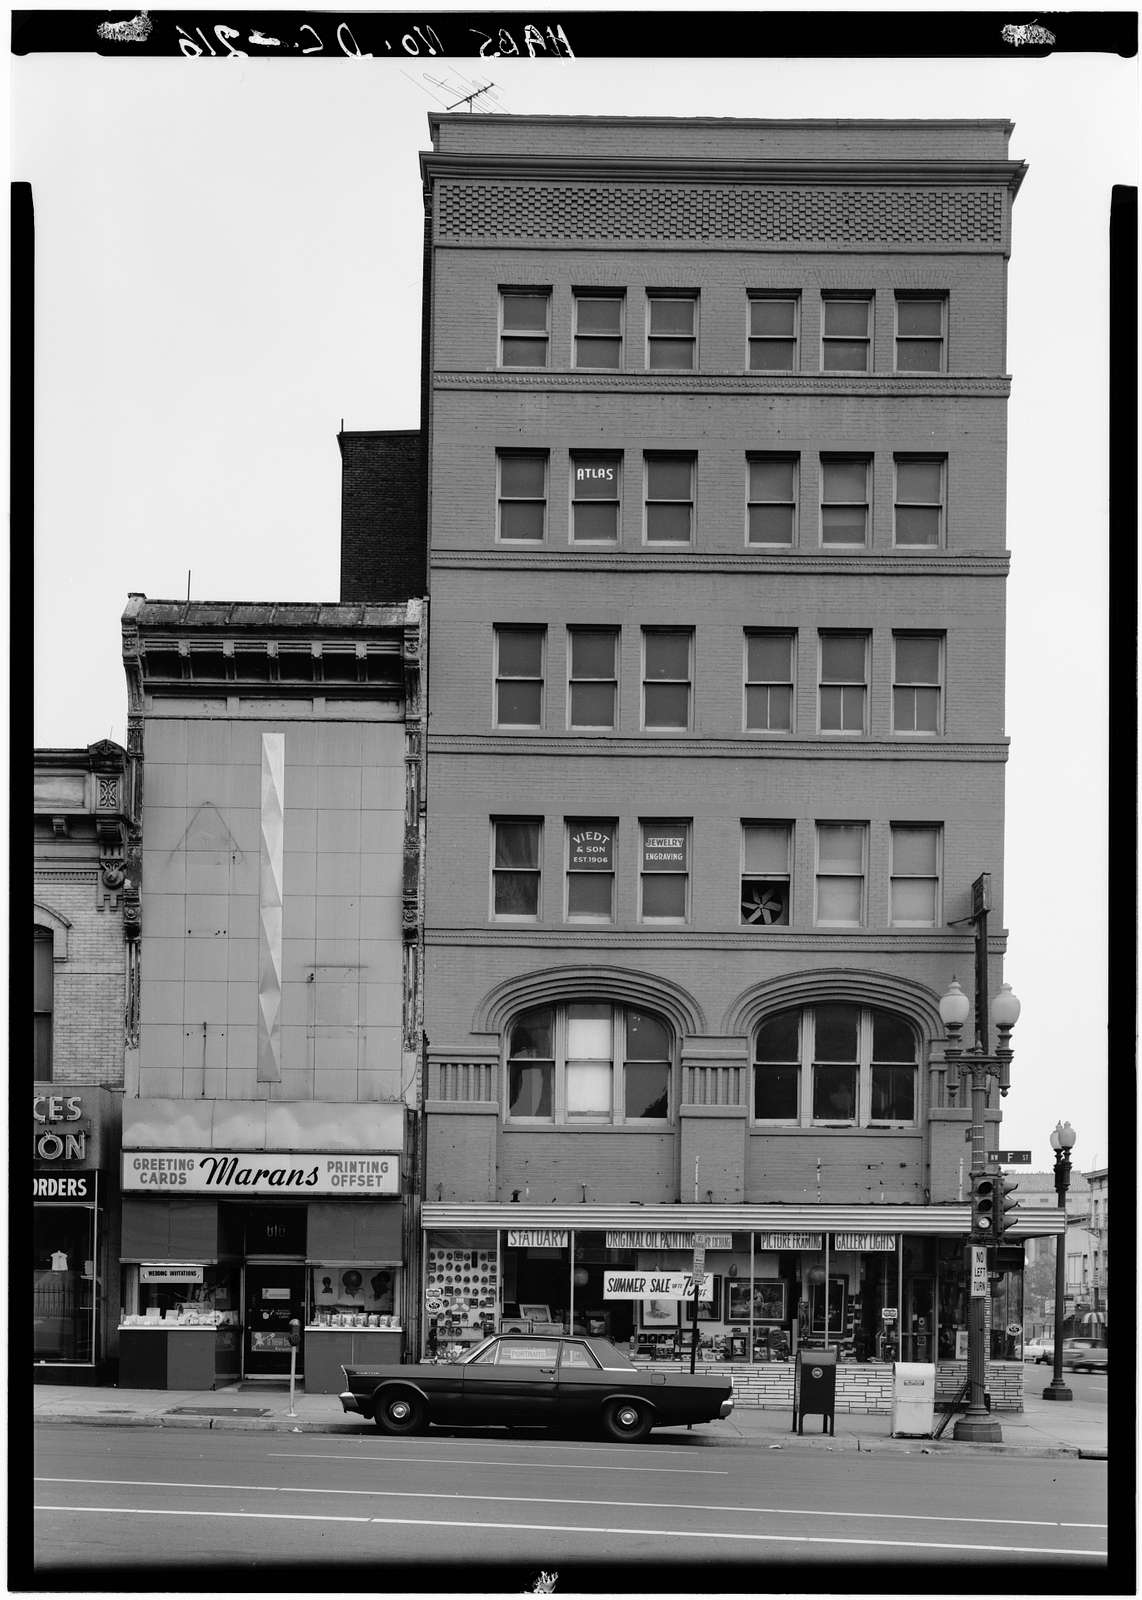 Warder Building, 527 Ninth Street Northwest, Washington, District of Columbia, DC